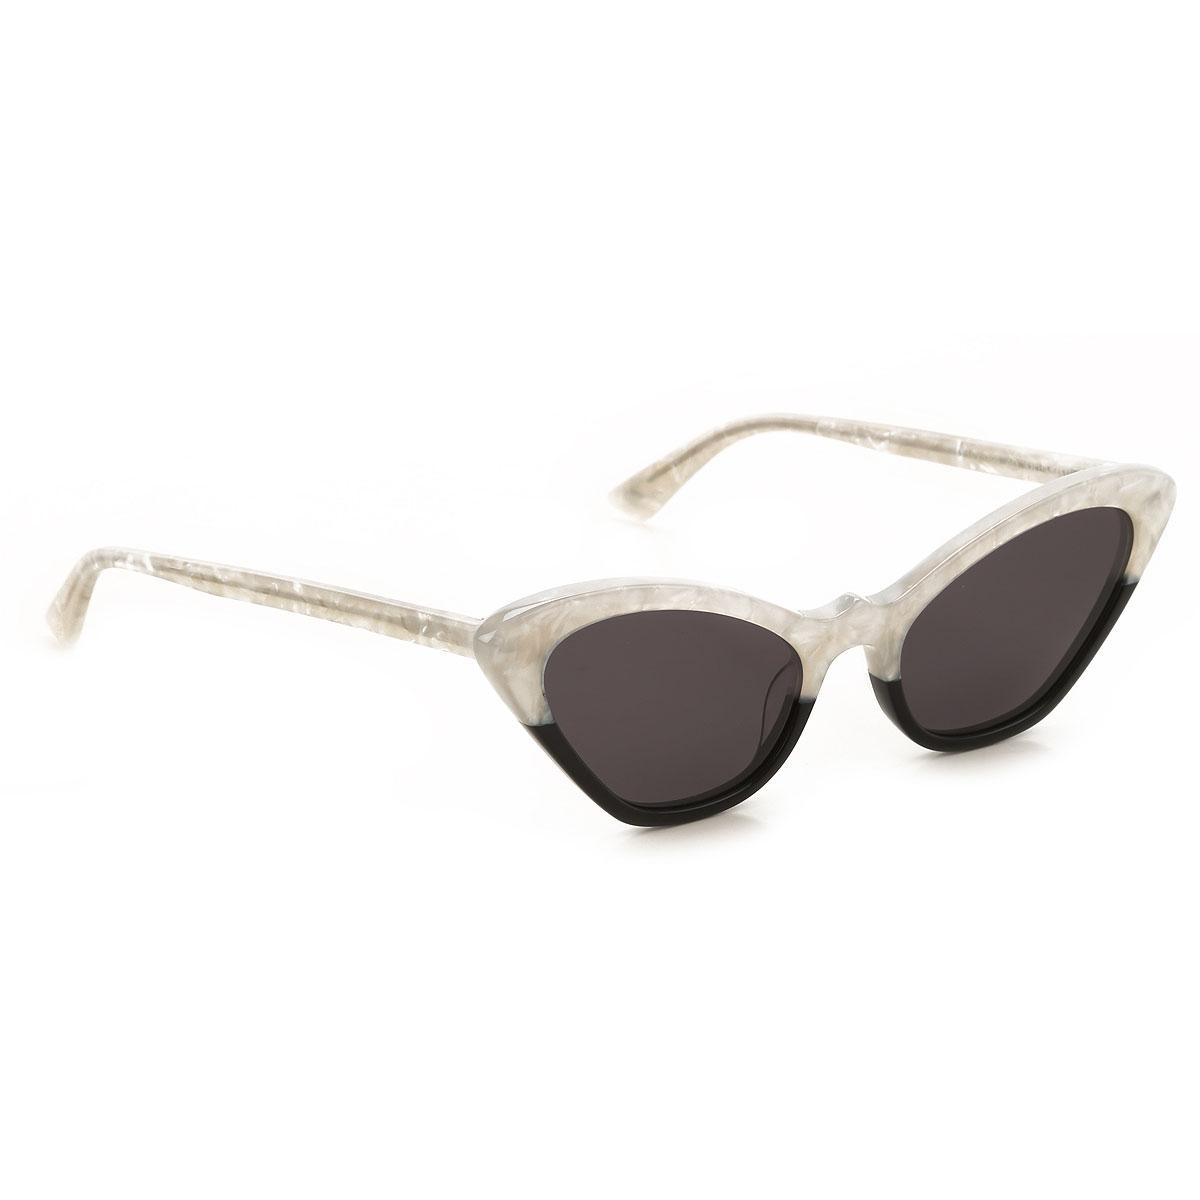 Alexander McQueen McQ Sunglasses On Sale, White Motherpearl, 2019